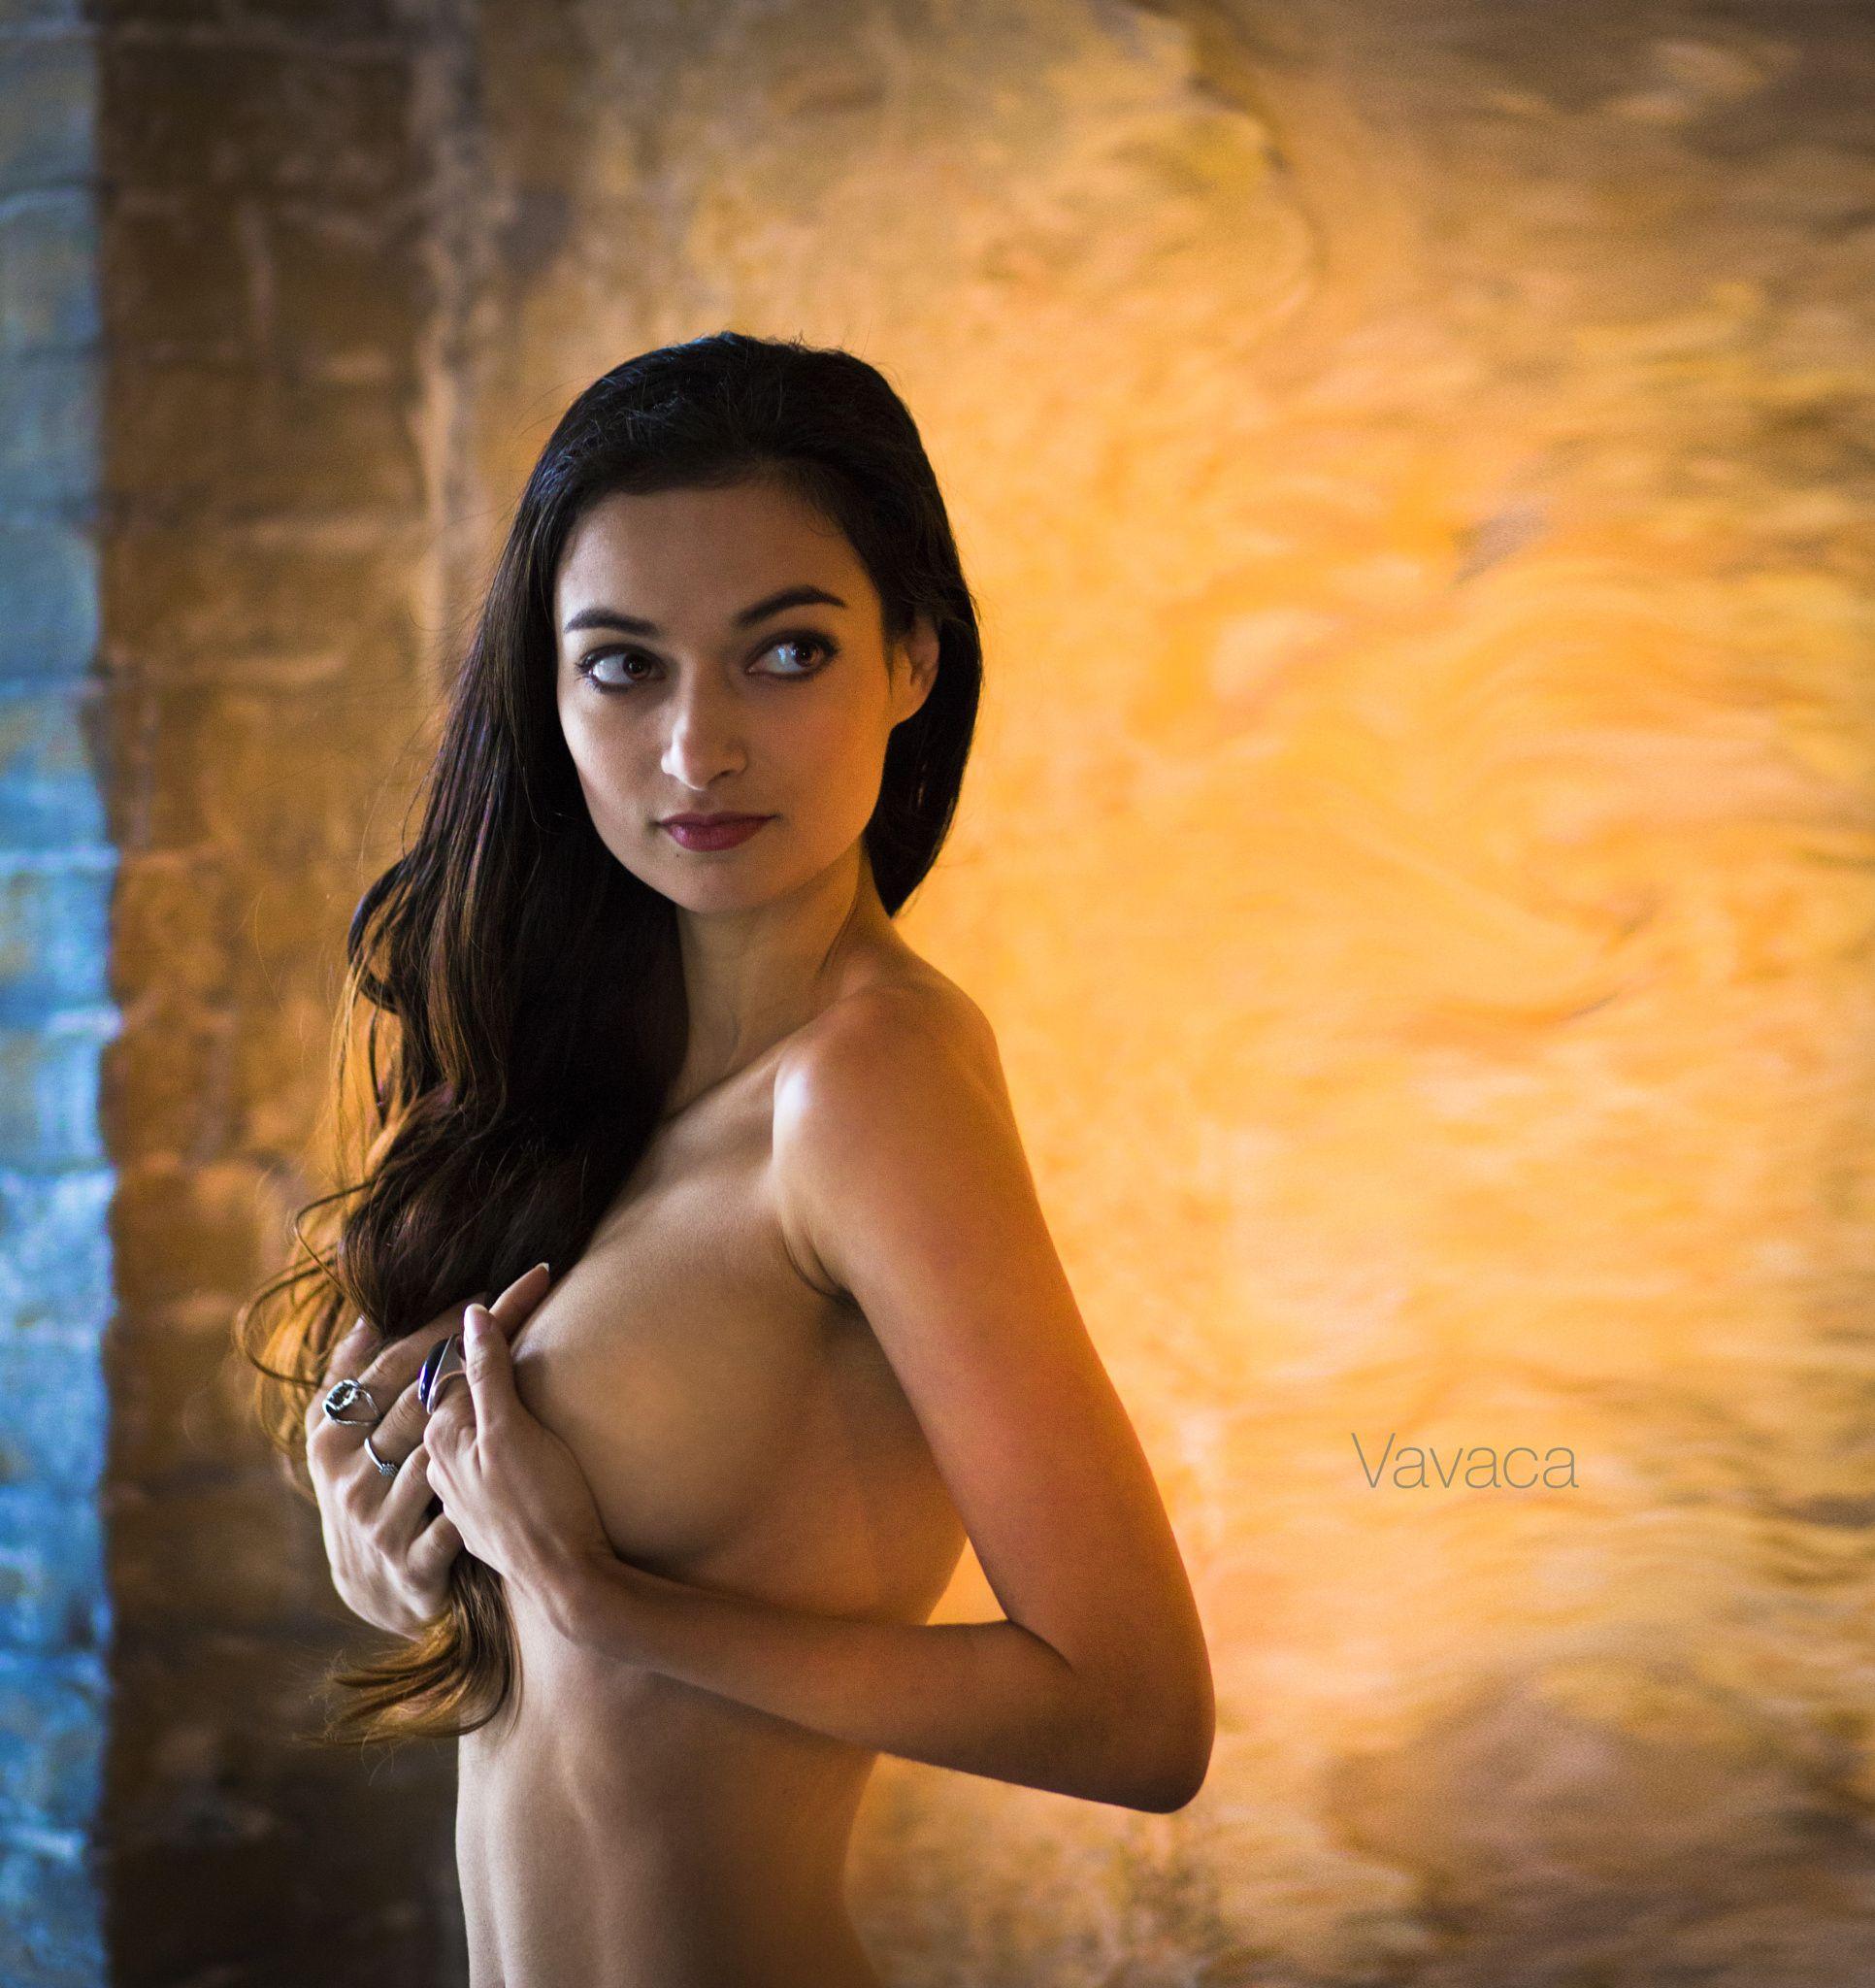 Pictures Naya Mamedova nude photos 2019